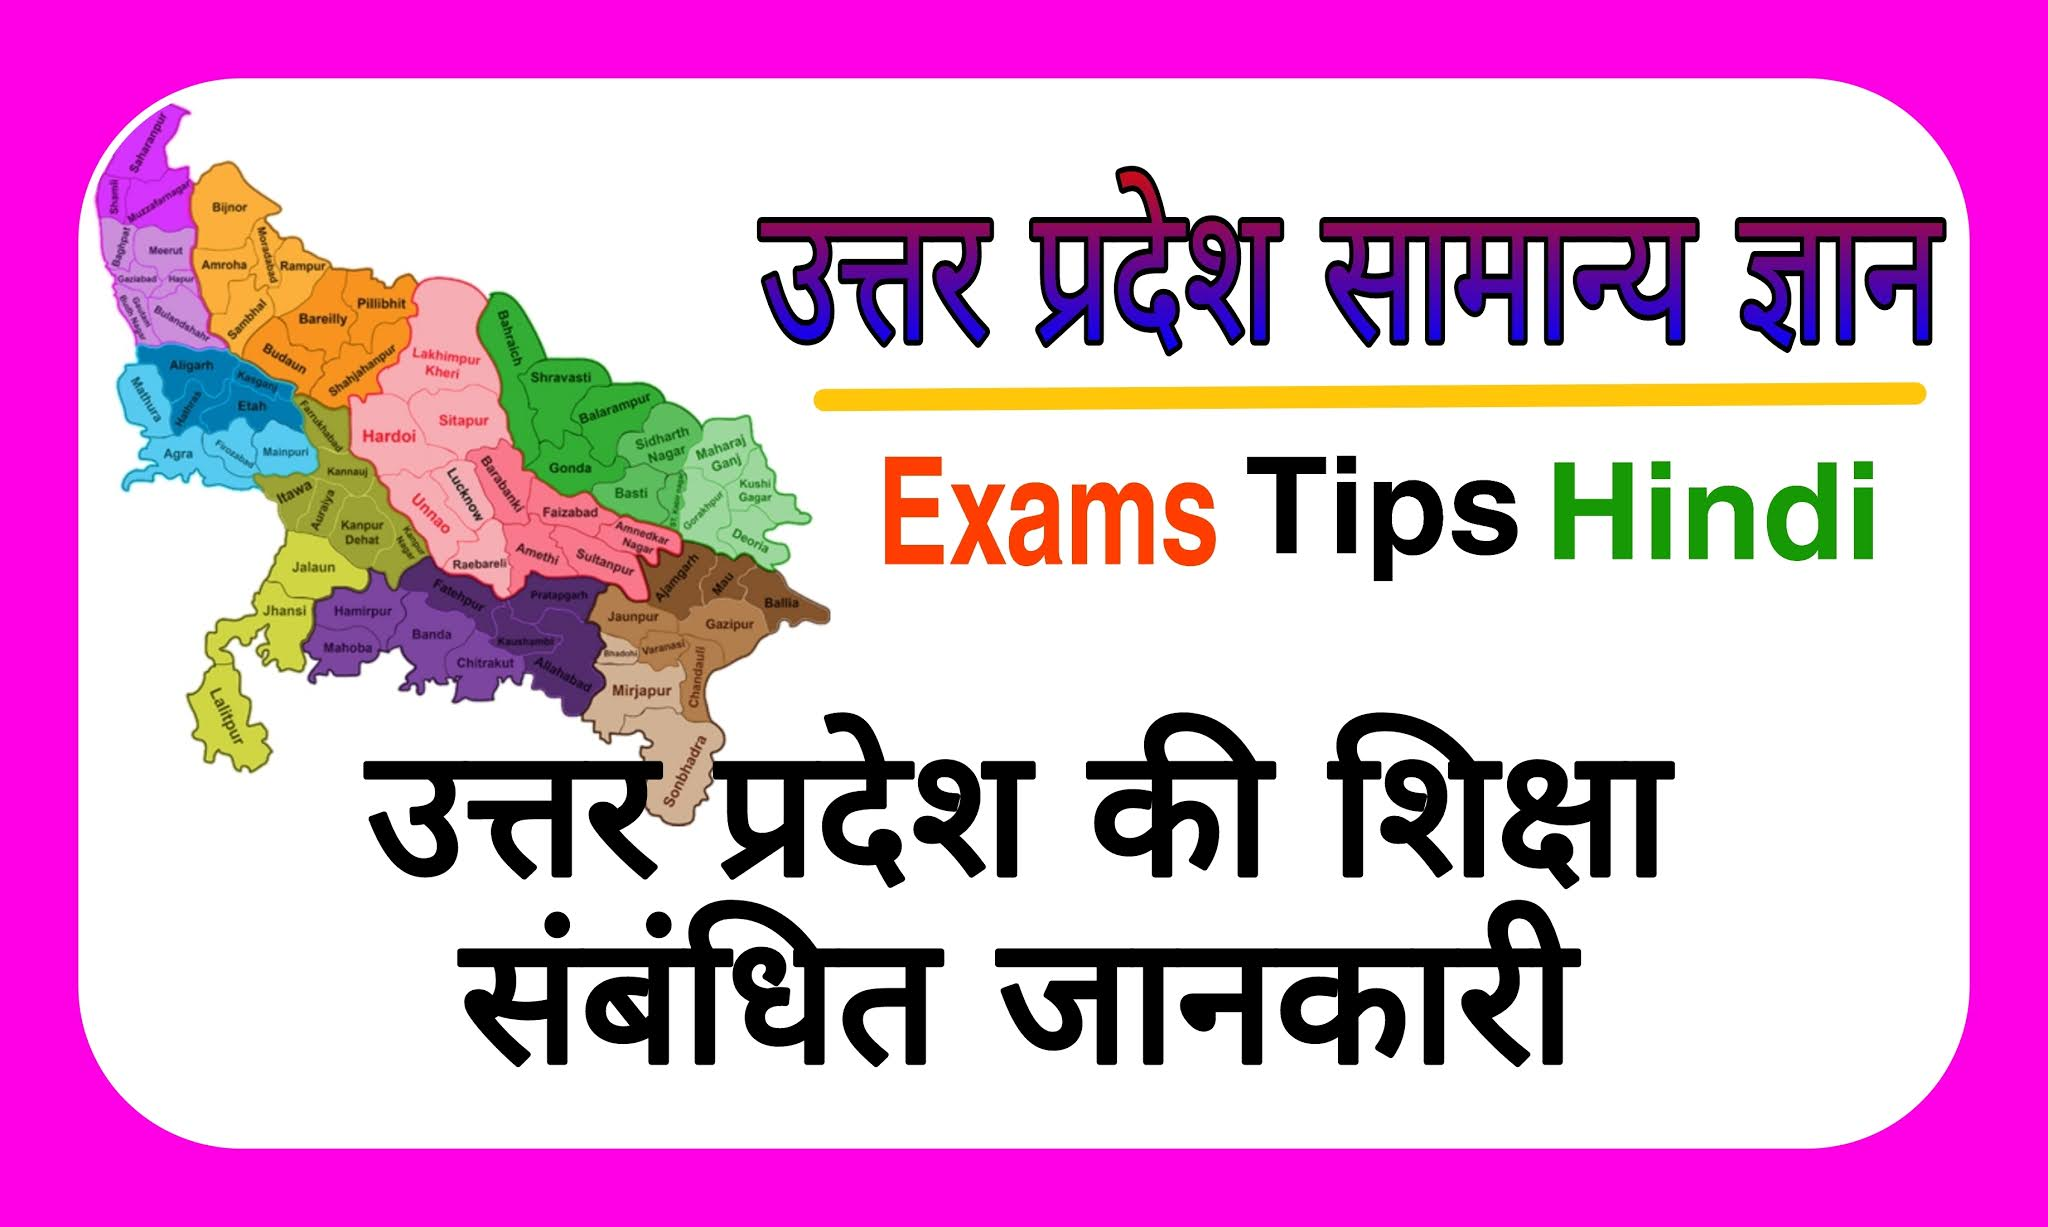 उत्तर प्रदेश GK, उत्तर प्रदेश की शिक्षा, UP Education GK in Hindi, UP education related gk in hindi, UP GK in Hindi, Uttar Pradesh ki Shiksha , UP ki Jankari